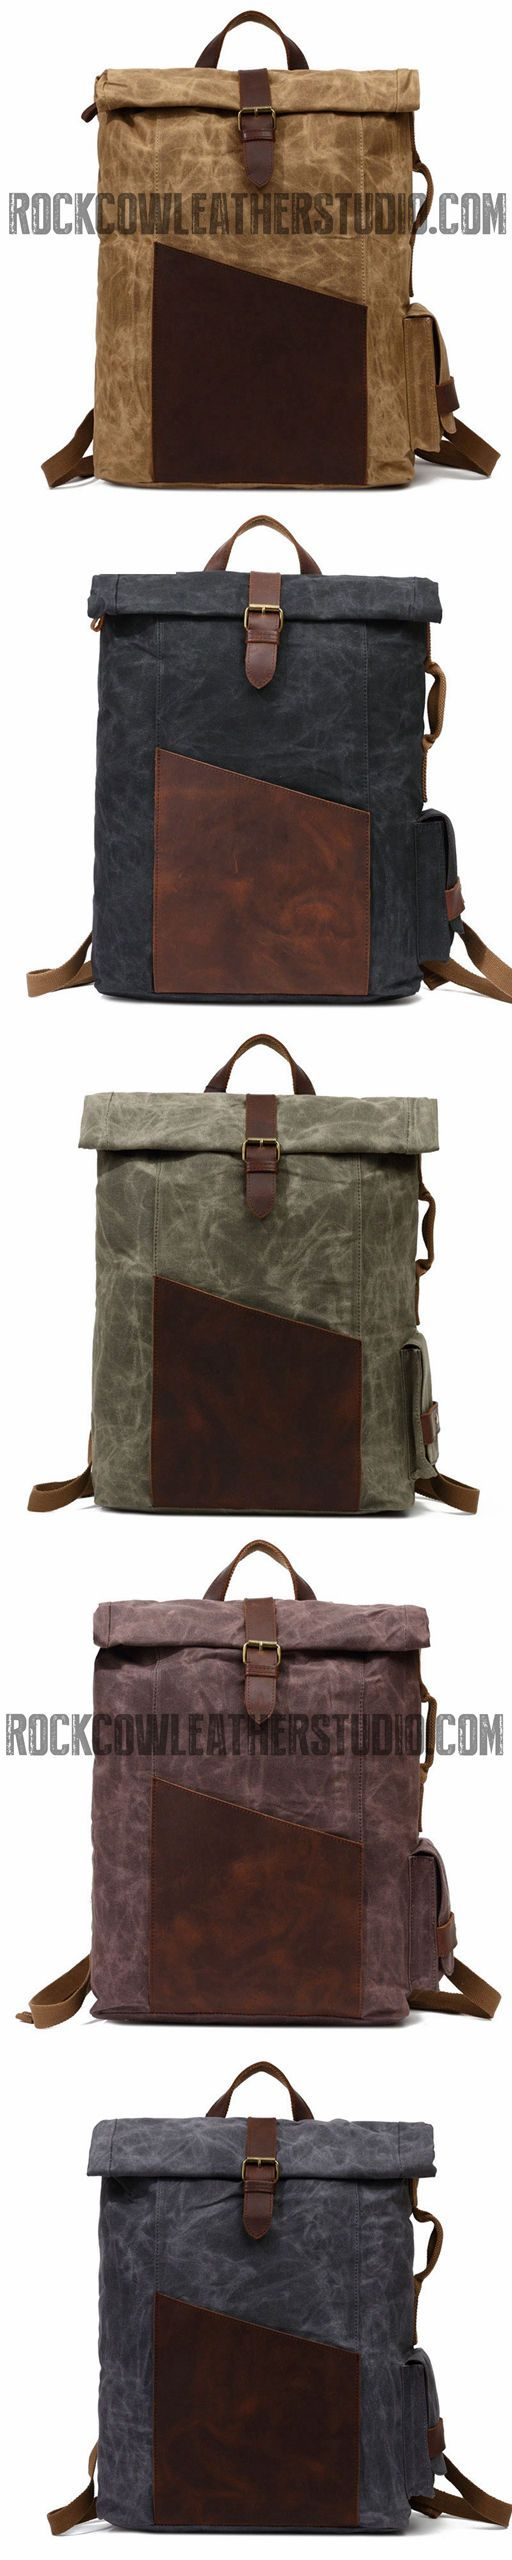 Waxed Canvas Wtih Leather Trim Backpack, School Book Bag, Hiking Bag FX902